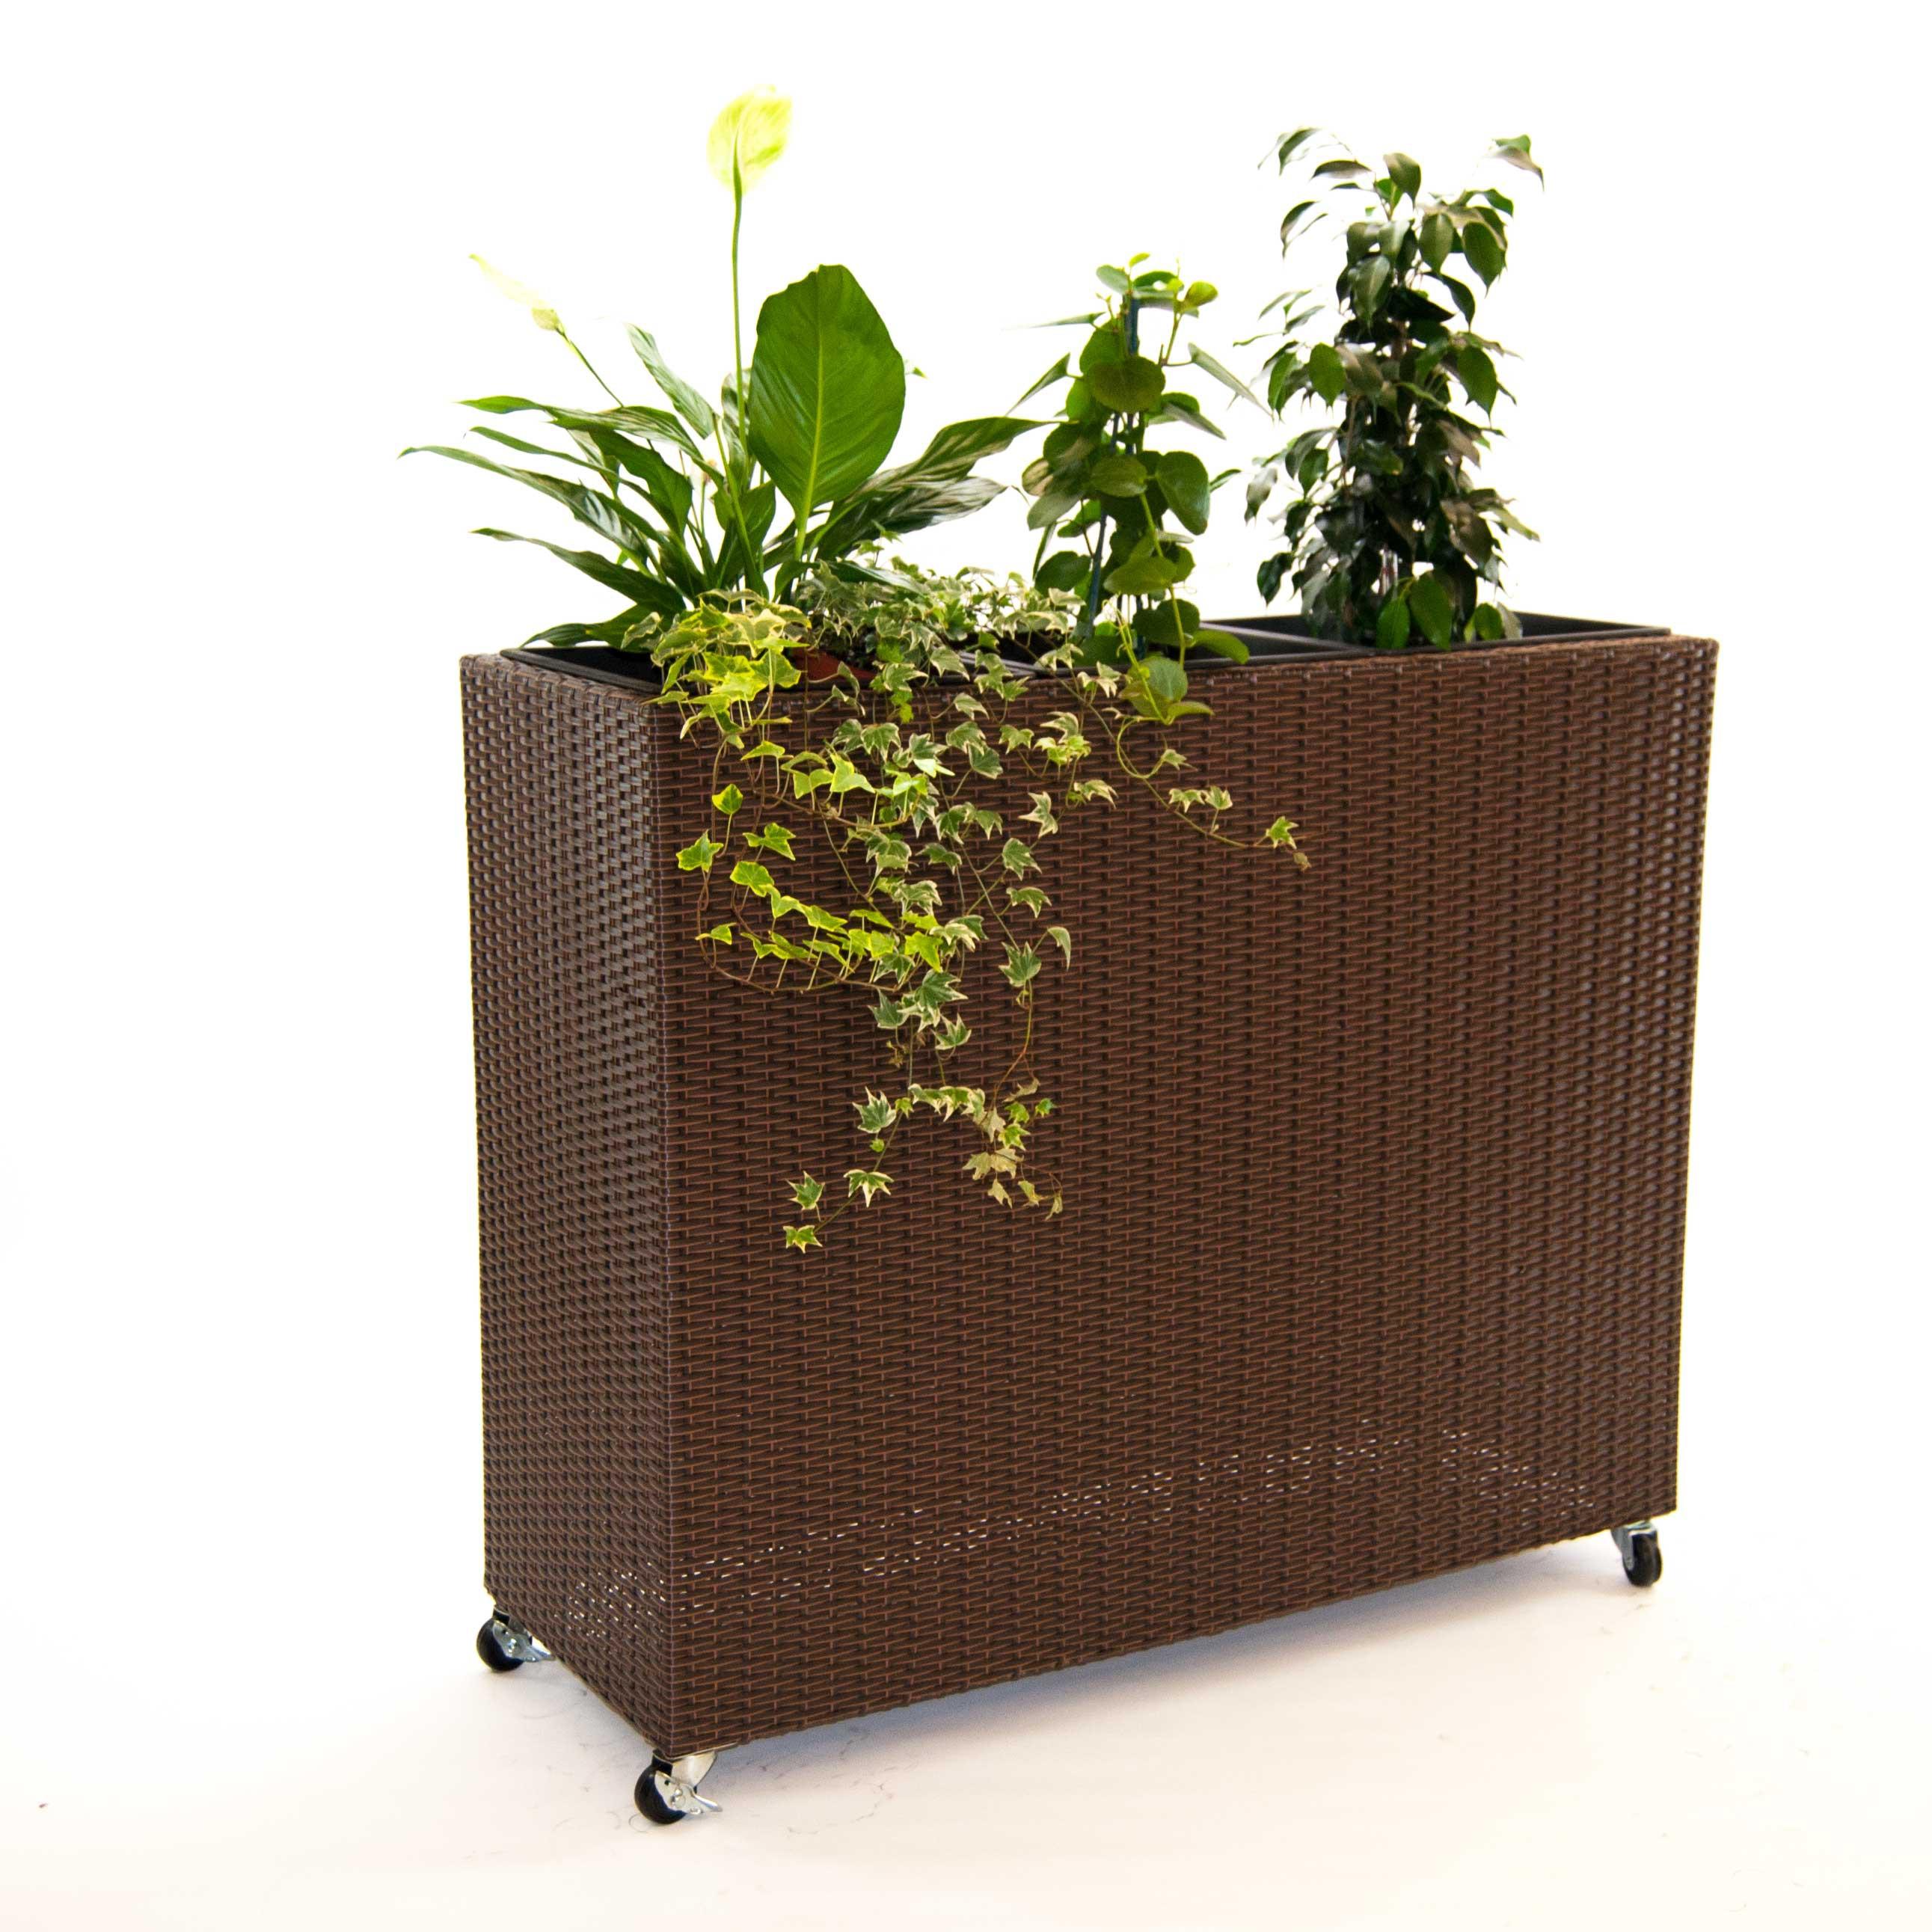 pflanzk bel pflanztrog polyrattan als raumteiler mit. Black Bedroom Furniture Sets. Home Design Ideas